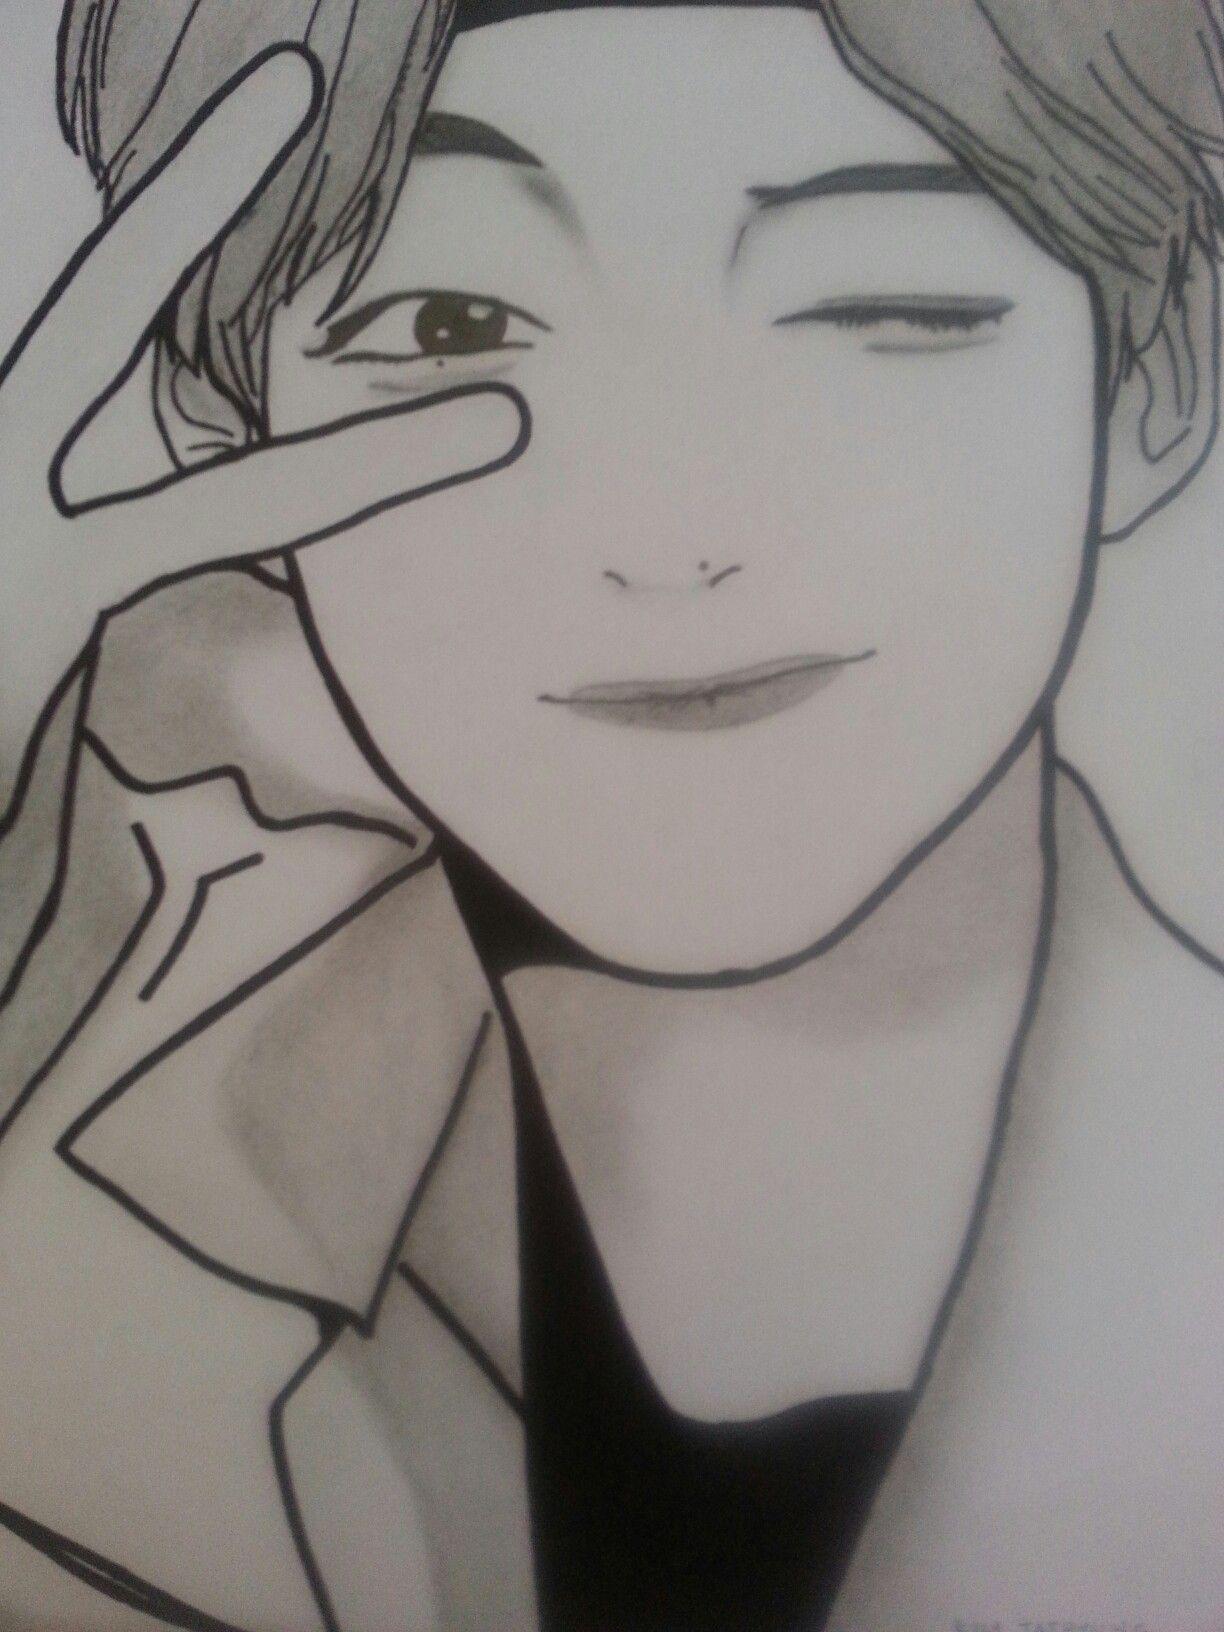 Kim Taehyung From Bts Kpop Drawings Easy Drawings Bts Drawings